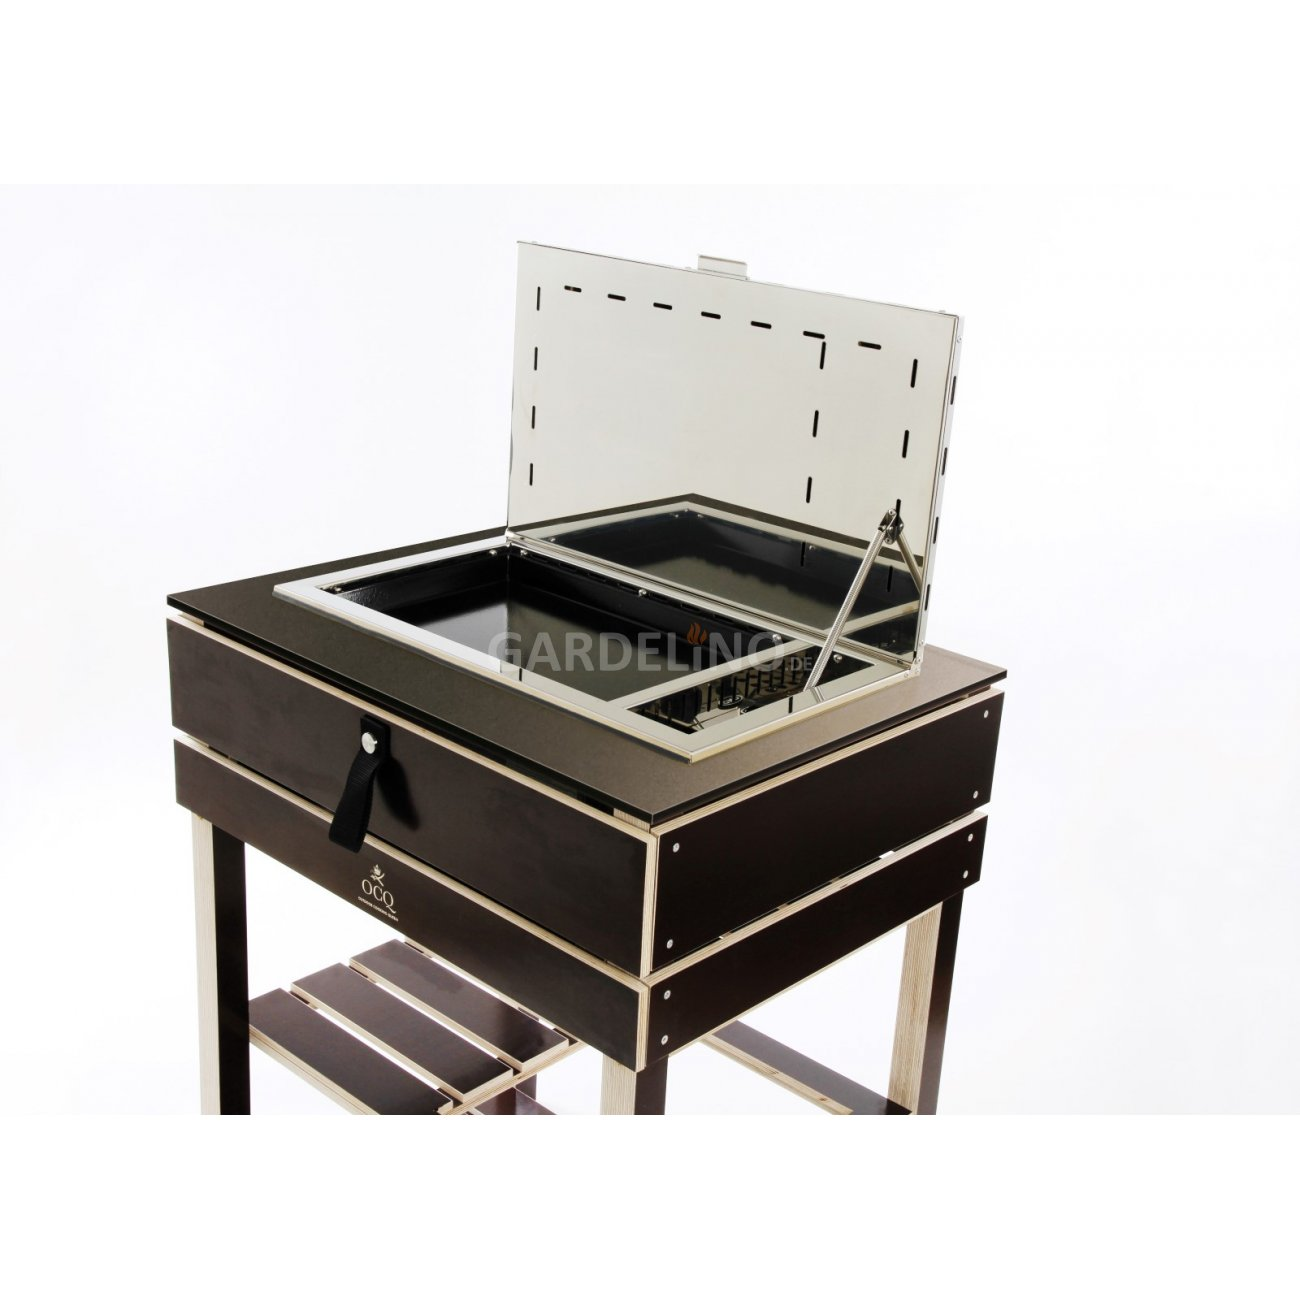 ocq gartenk che element mit plancha grill. Black Bedroom Furniture Sets. Home Design Ideas